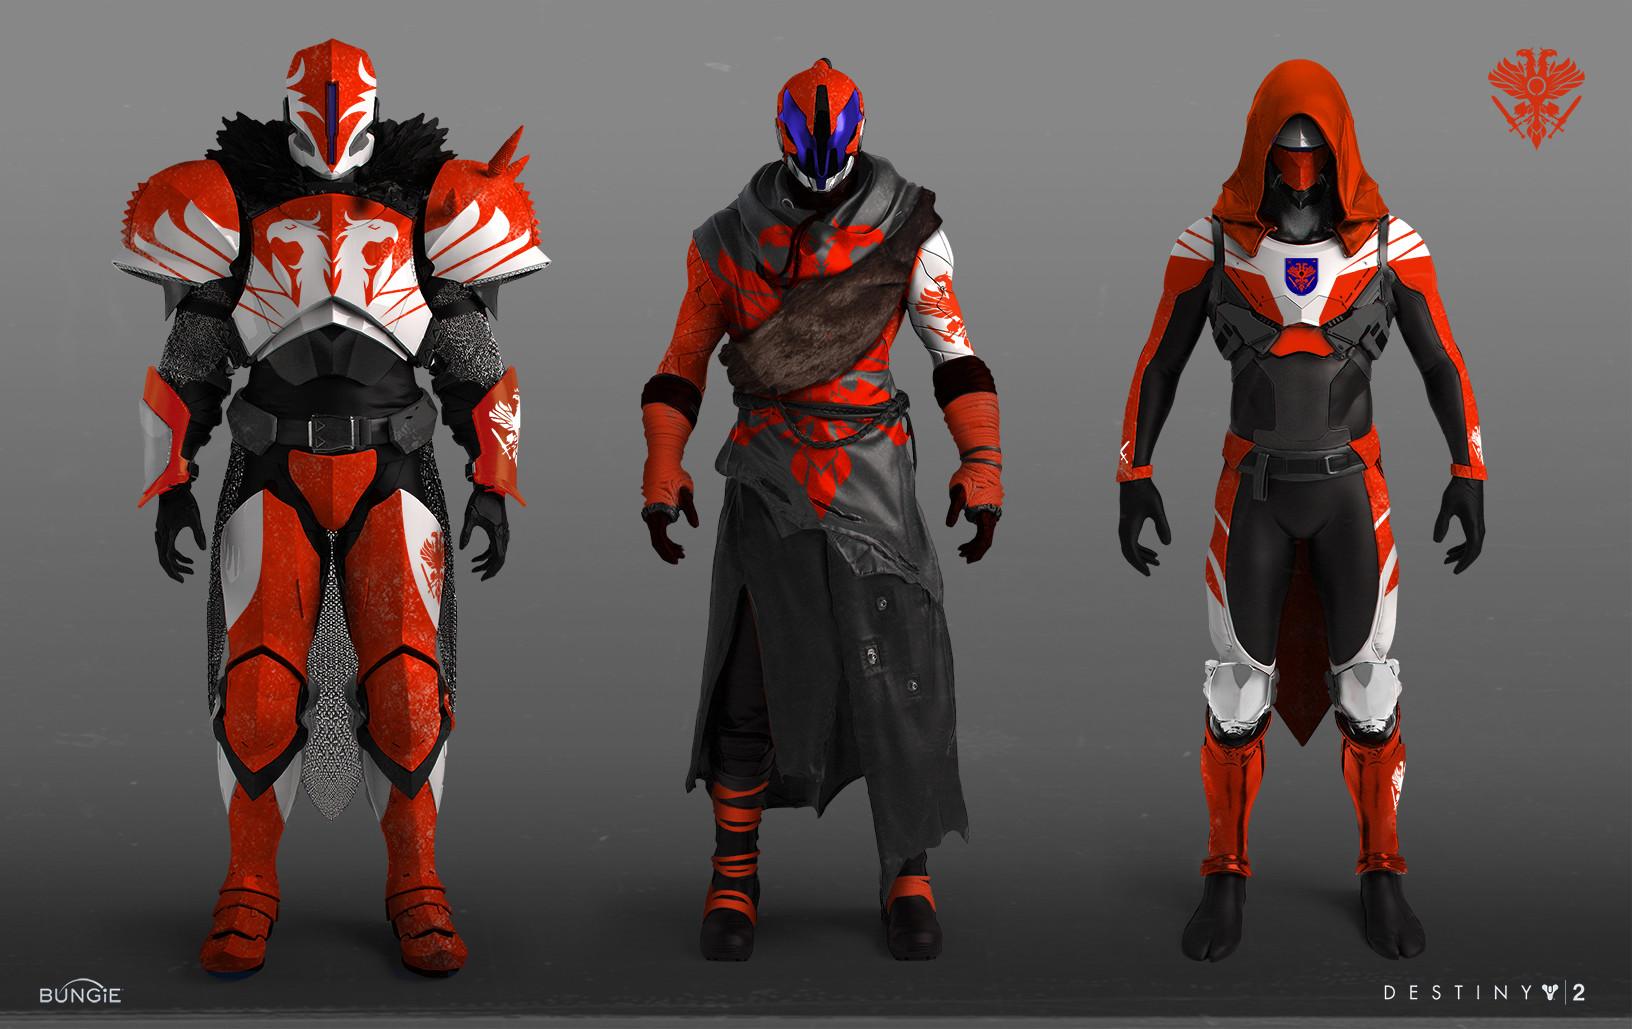 Destiny 2 Concept Art by Joseph Cross | Concept Art World